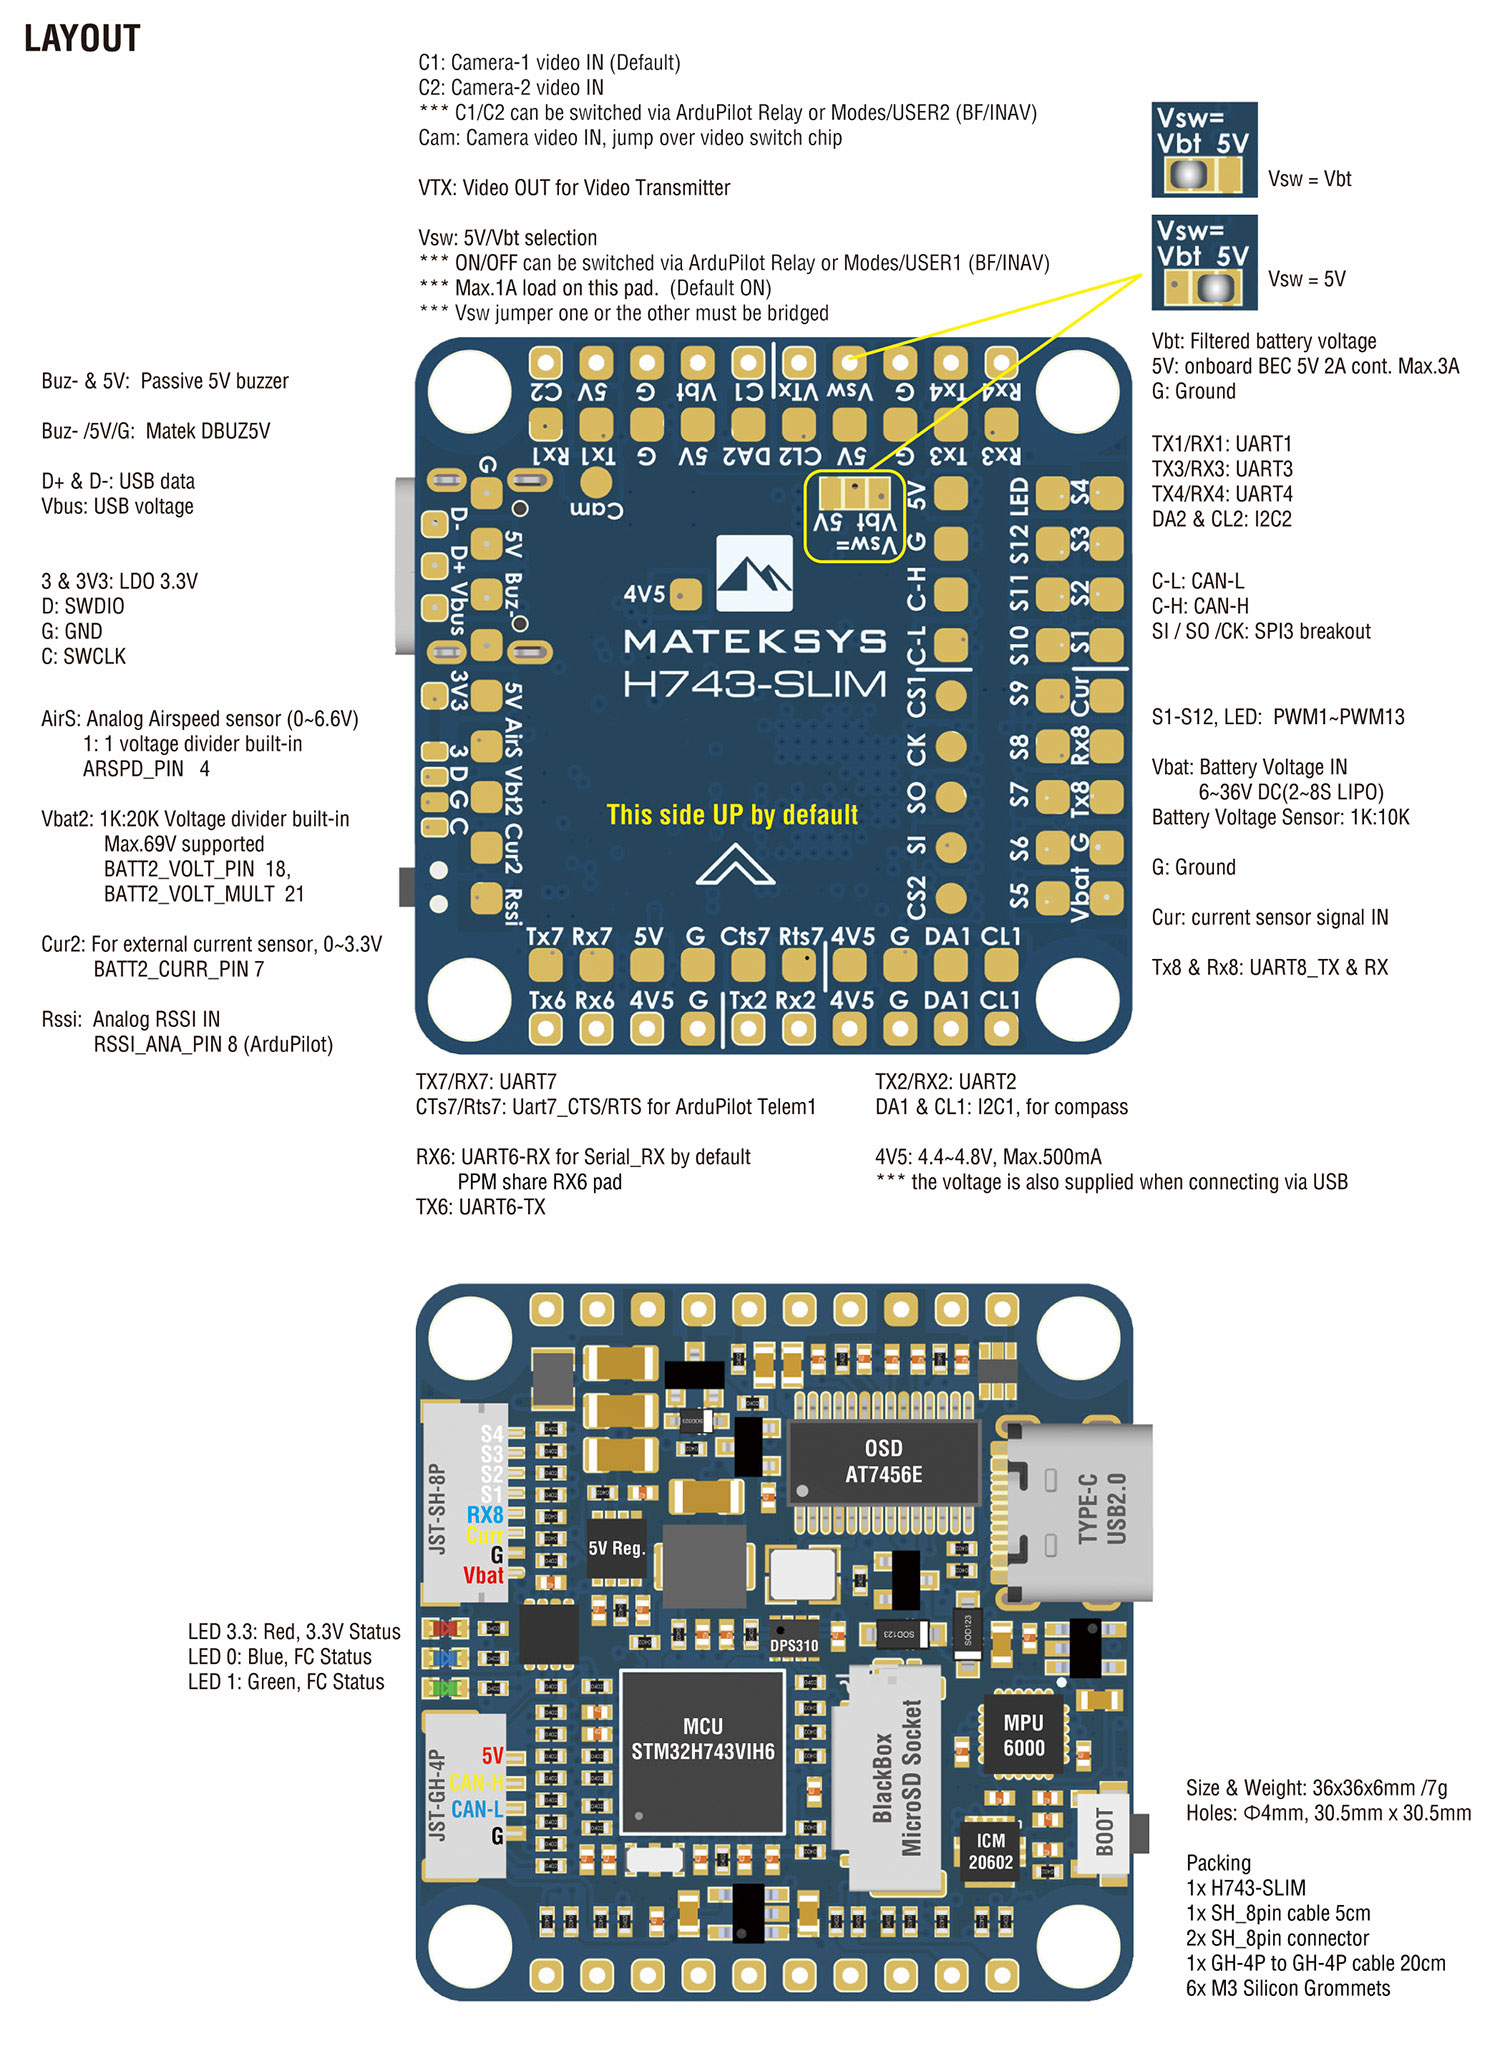 matek-h743-slim-flightcontroller_5.jpg